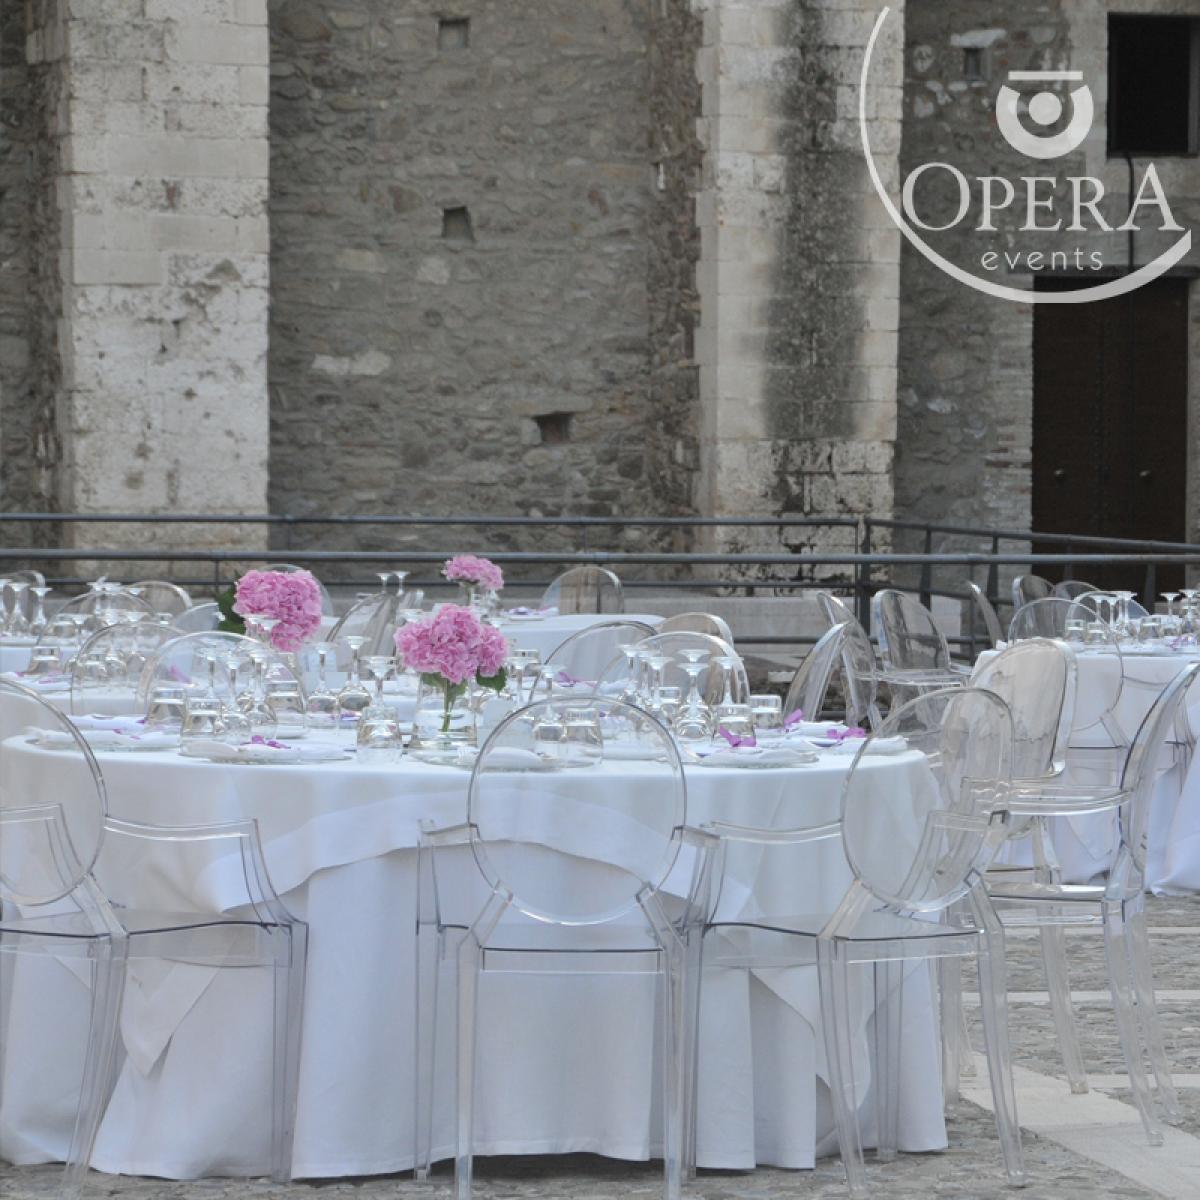 Sedia Kartell Louis Ghost - Opera Events banqueting e d\'eccellenza